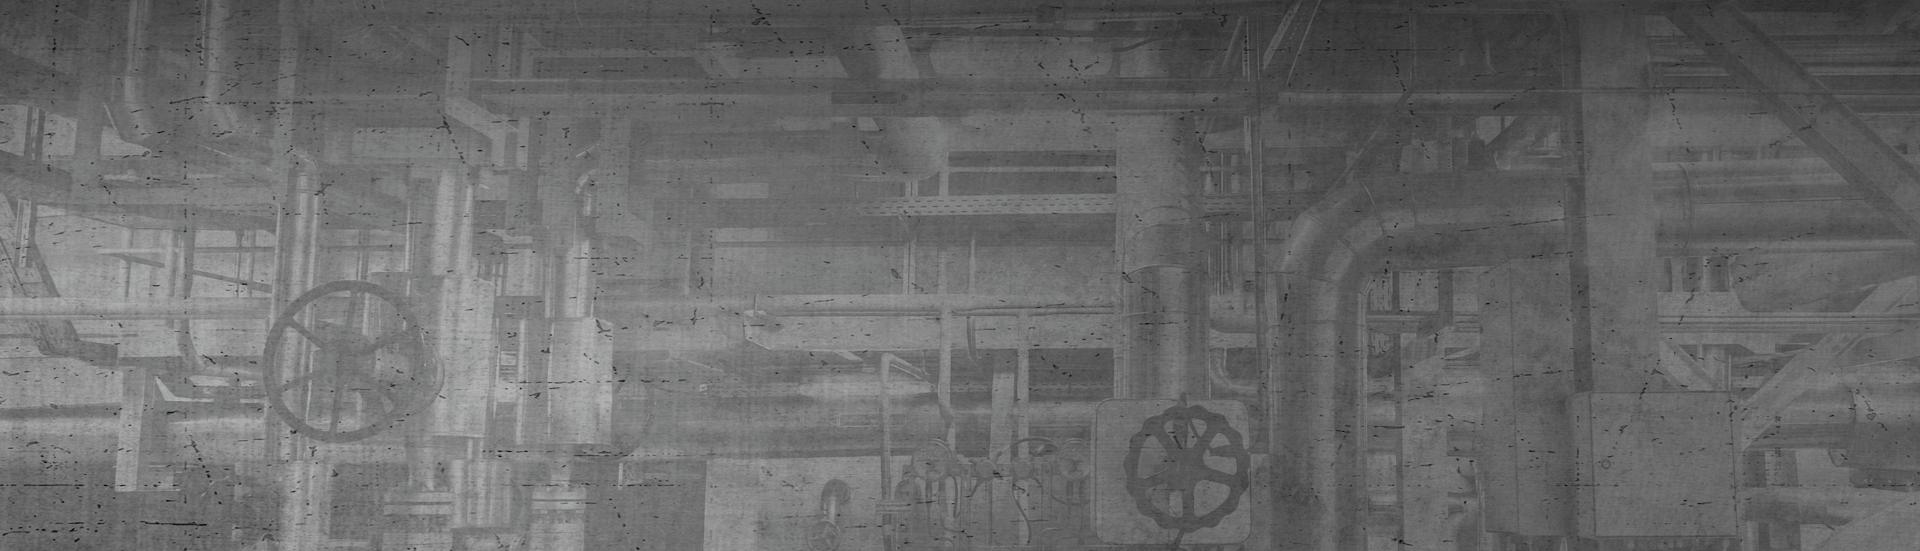 industrial-burner-equipment-distributors.jpg